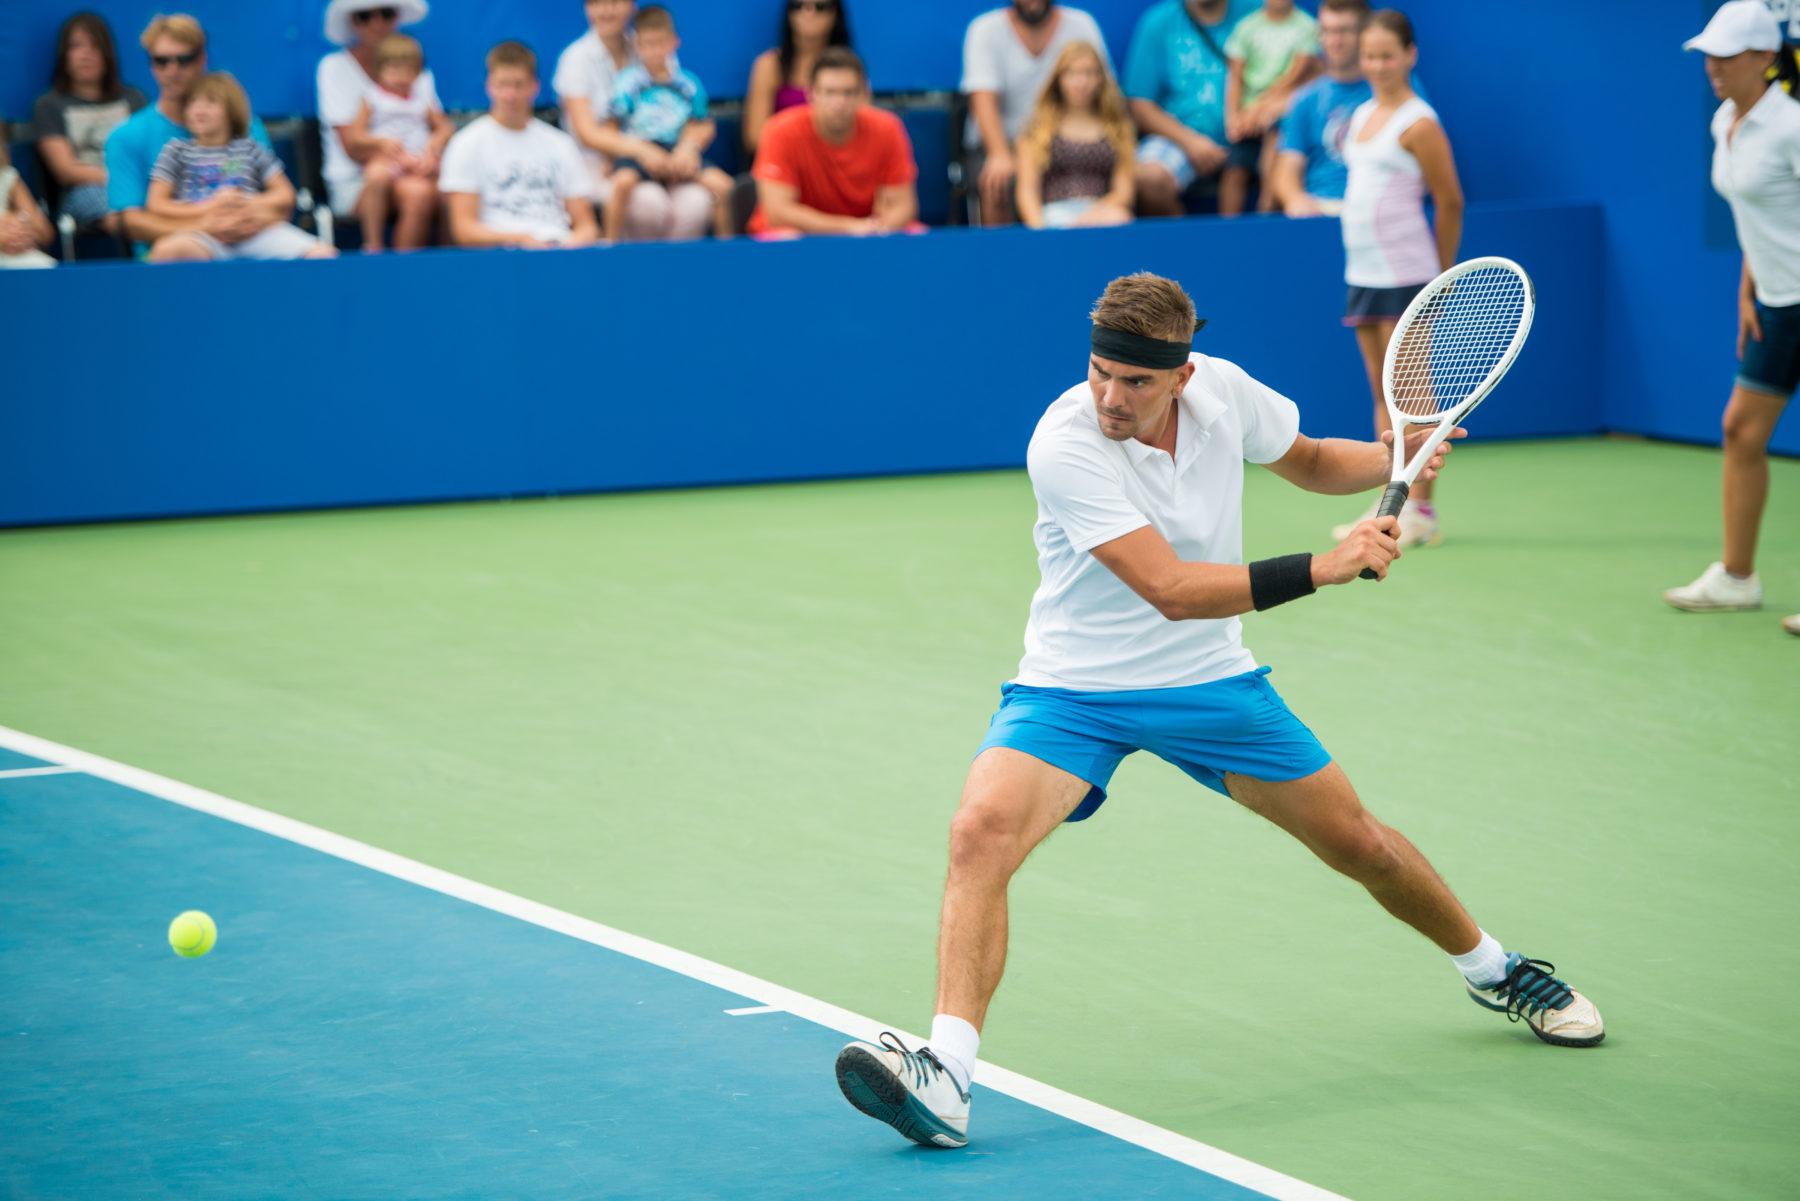 High Performance Tennis Training Program